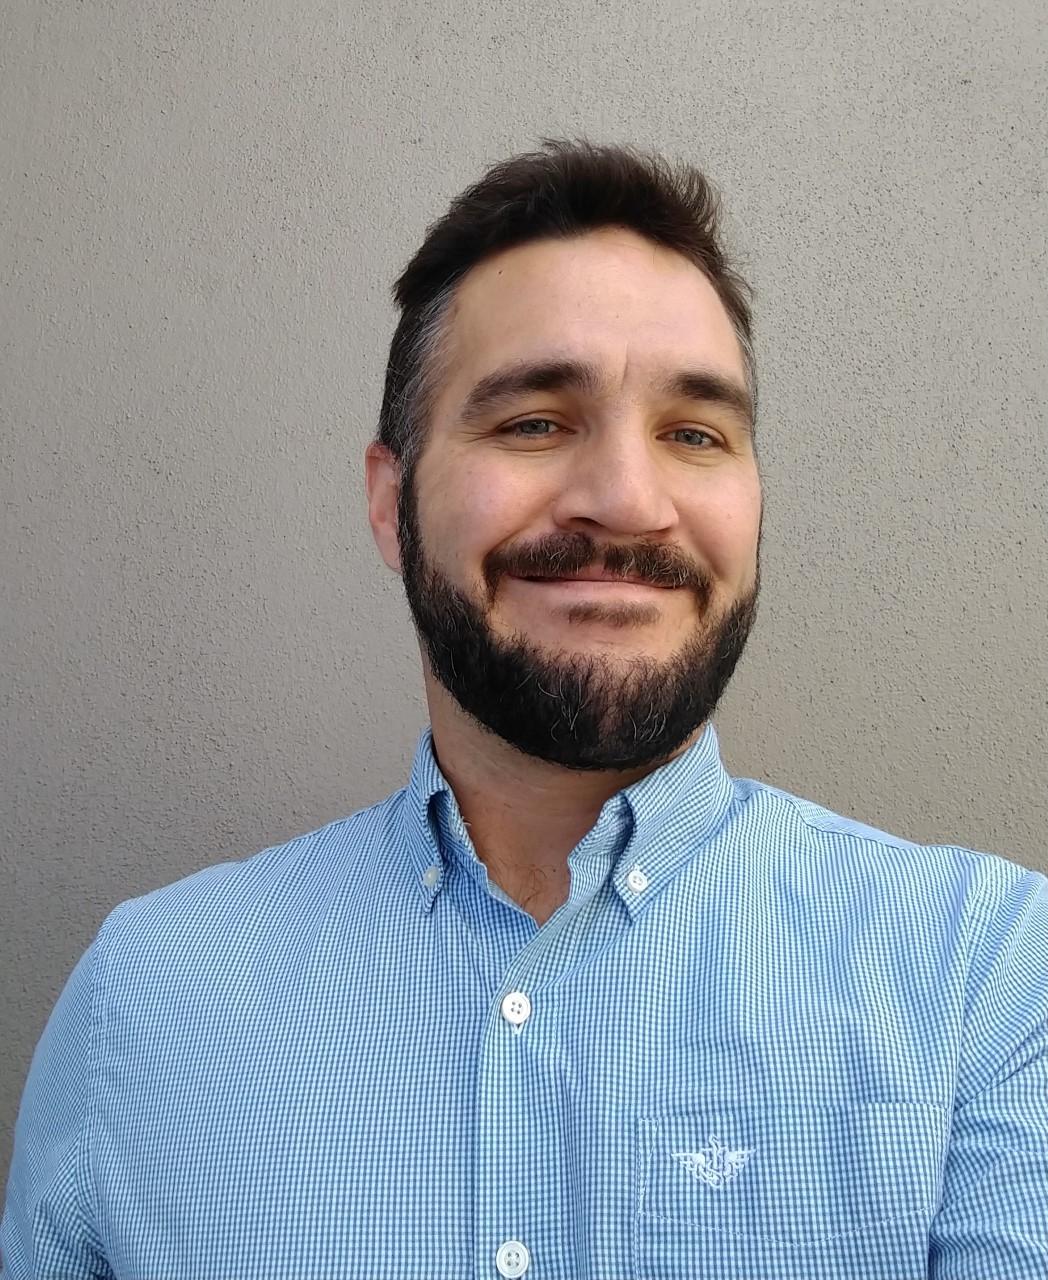 Jesse Maldonado, Food Safety Leader at DF Bakery